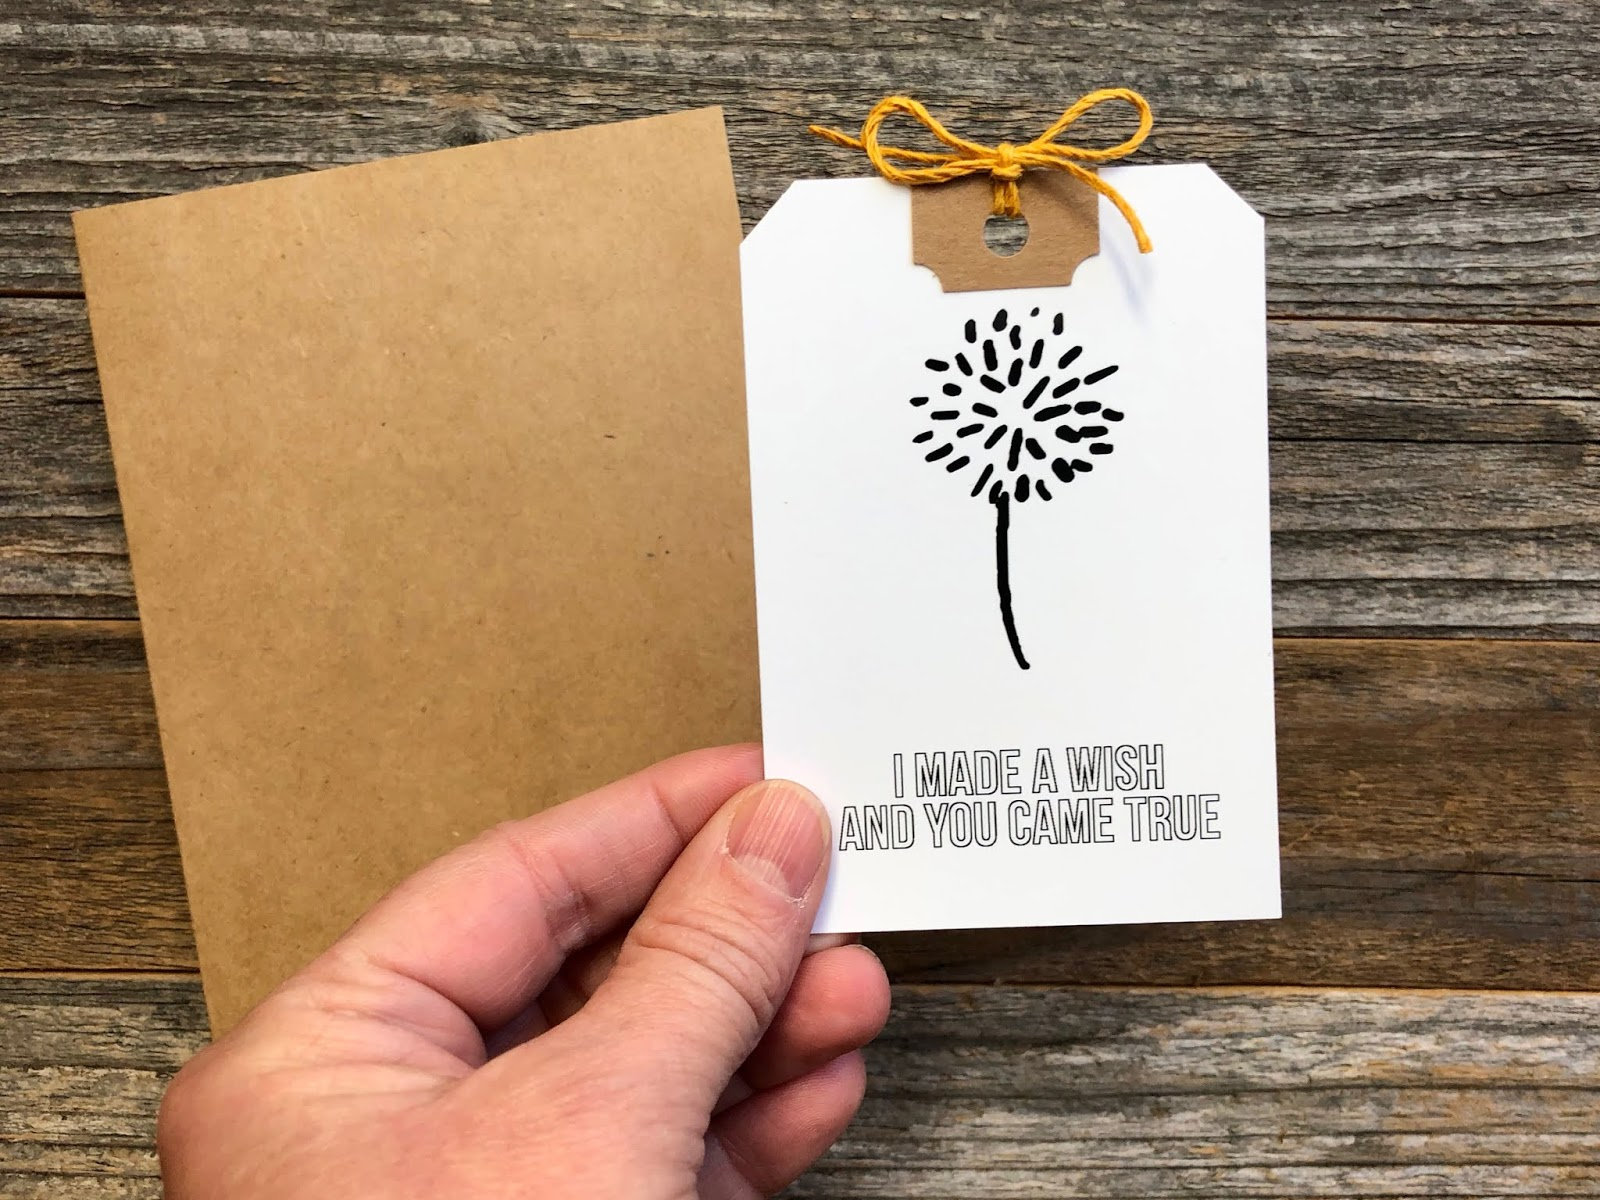 #Dandelion Wishes #dandelion #cardmaking #card #I Made A Wish #make a wish #romantic card